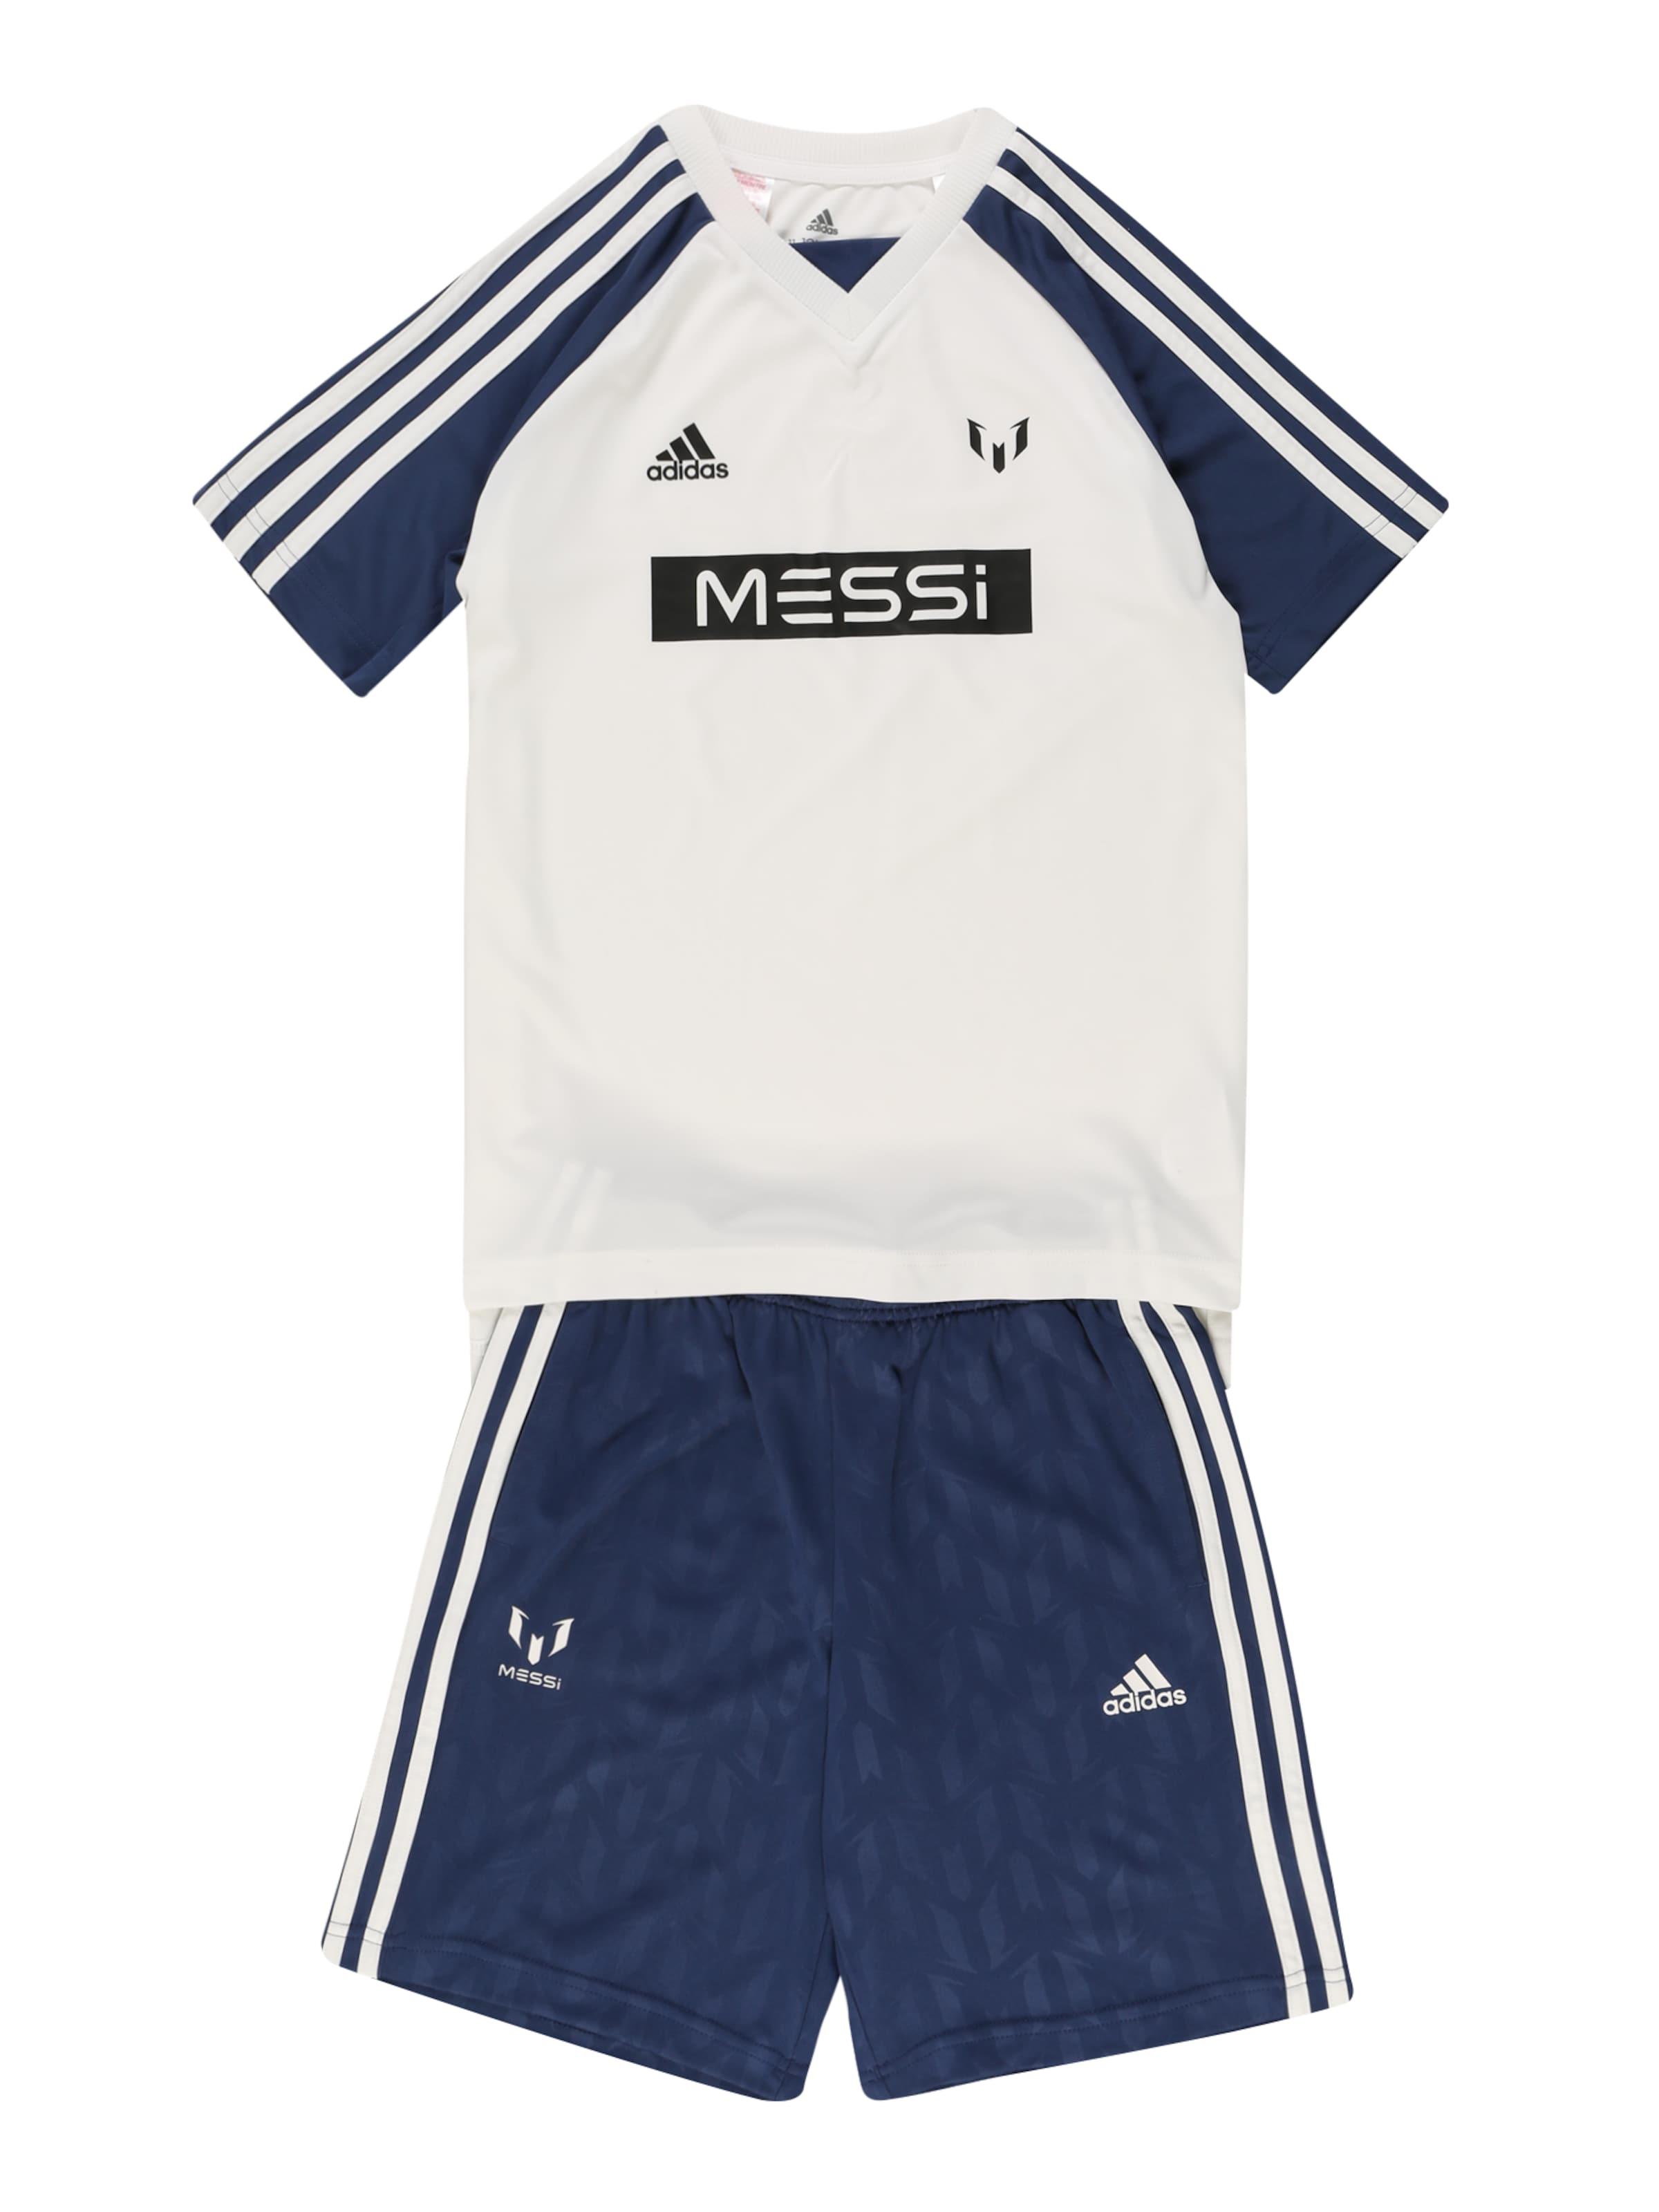 Jungen,  Kinder,  Kinder ADIDAS PERFORMANCE Trainingsanzug blau,  weiß   04062049649264